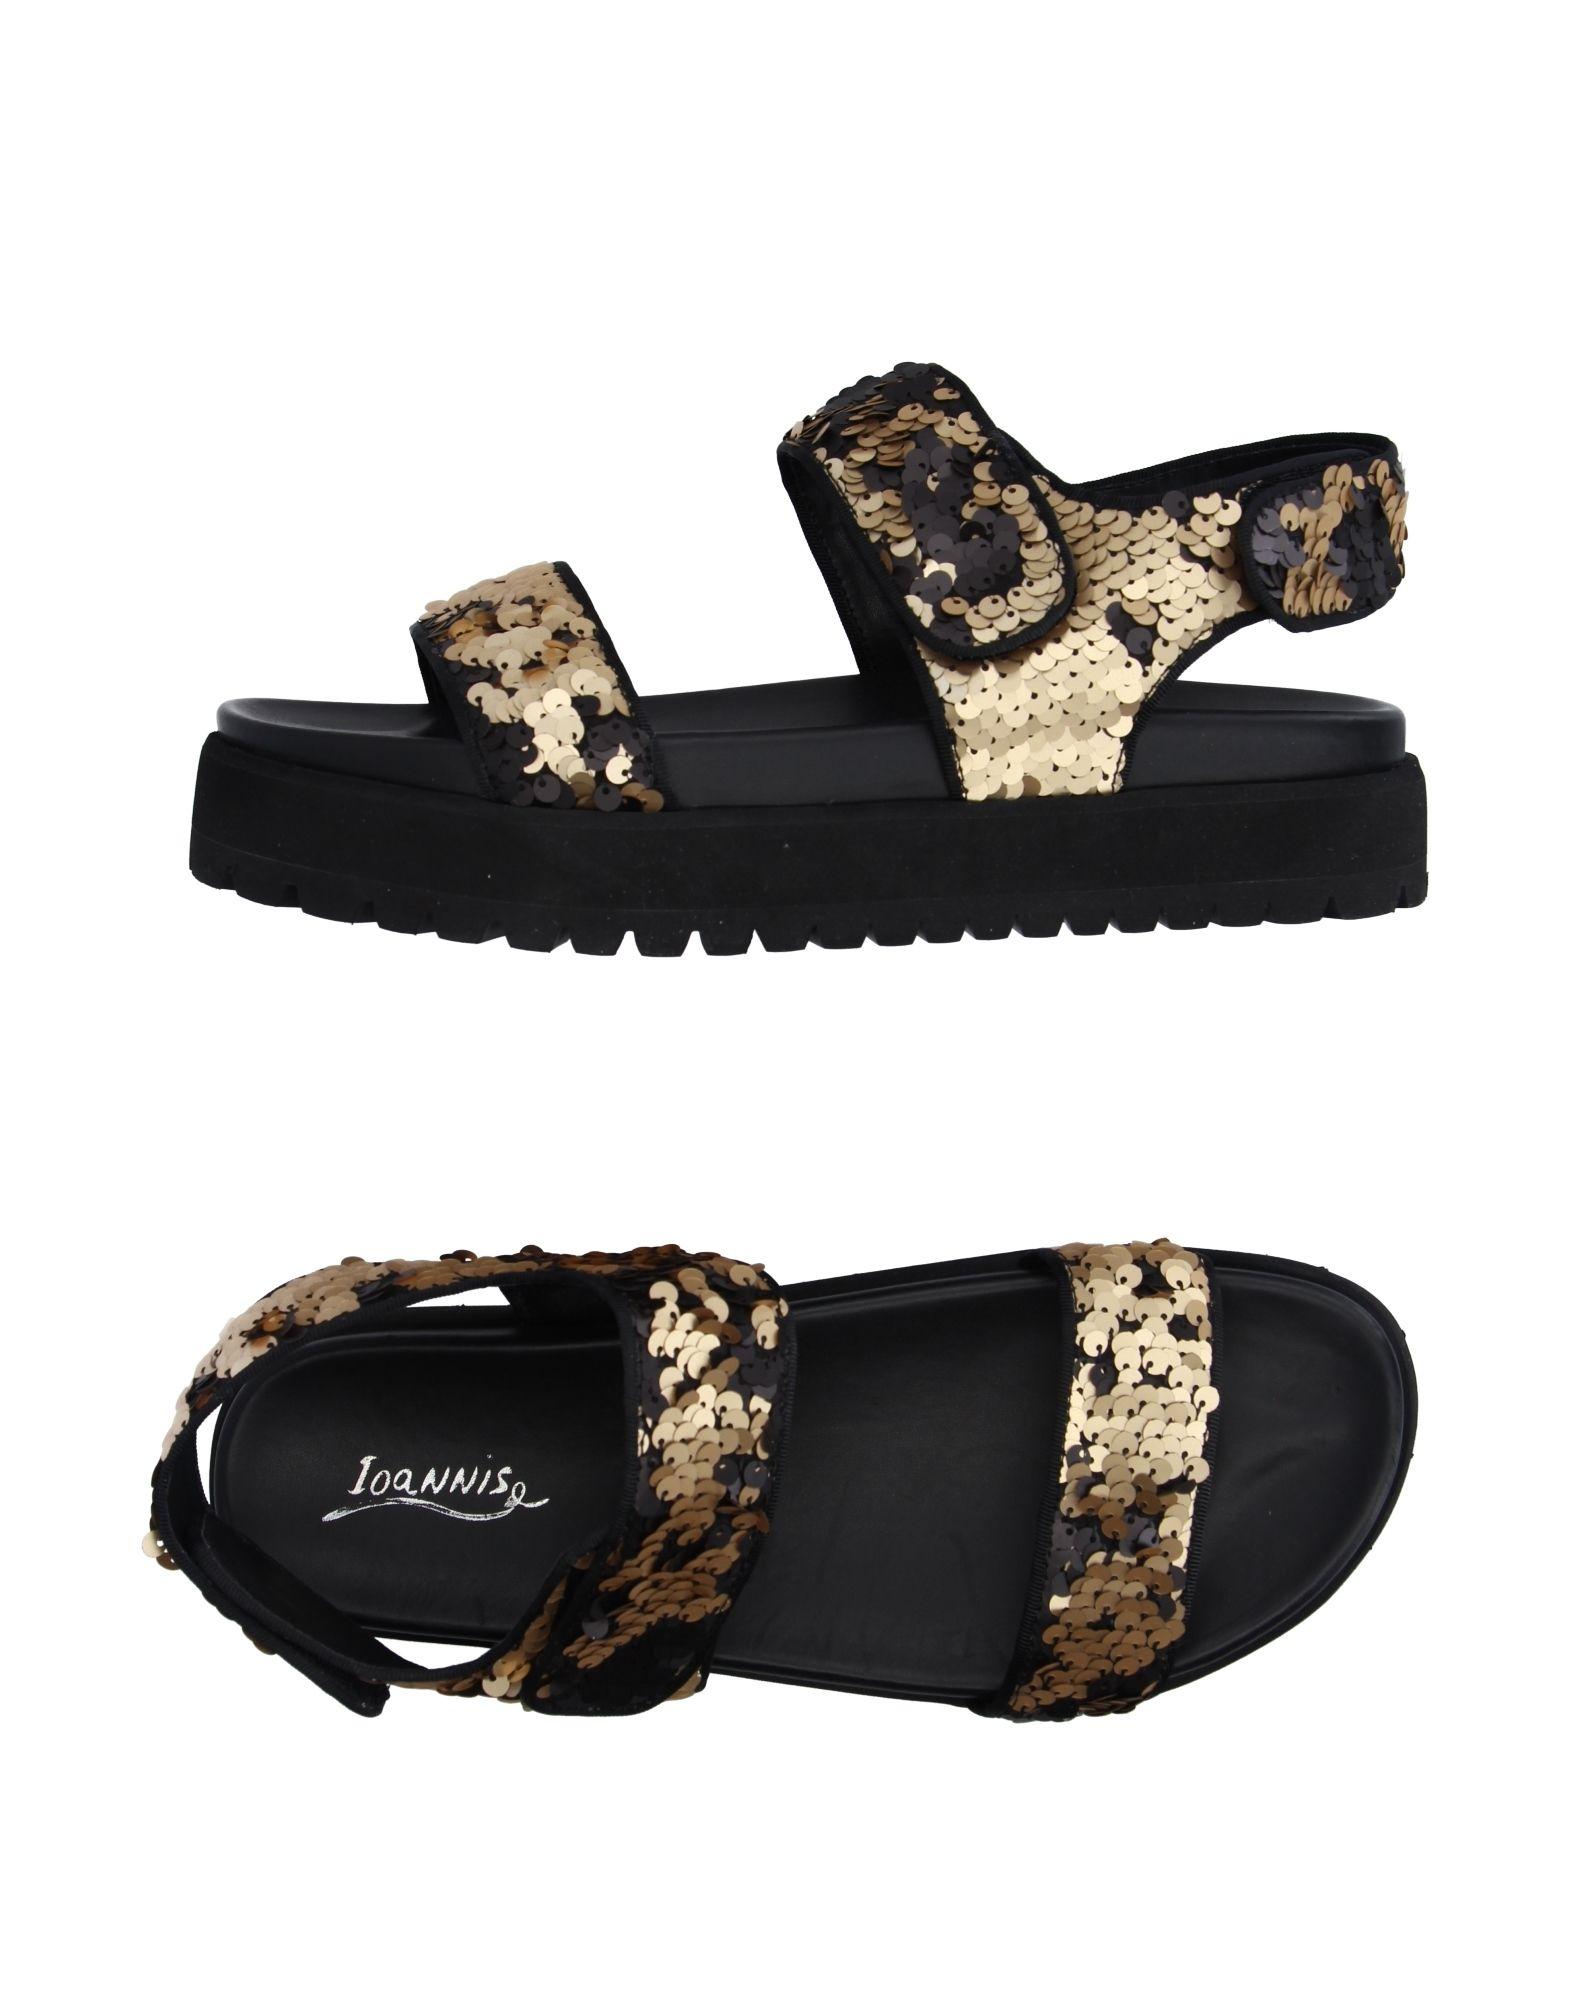 IOANNIS Sandals in Gold